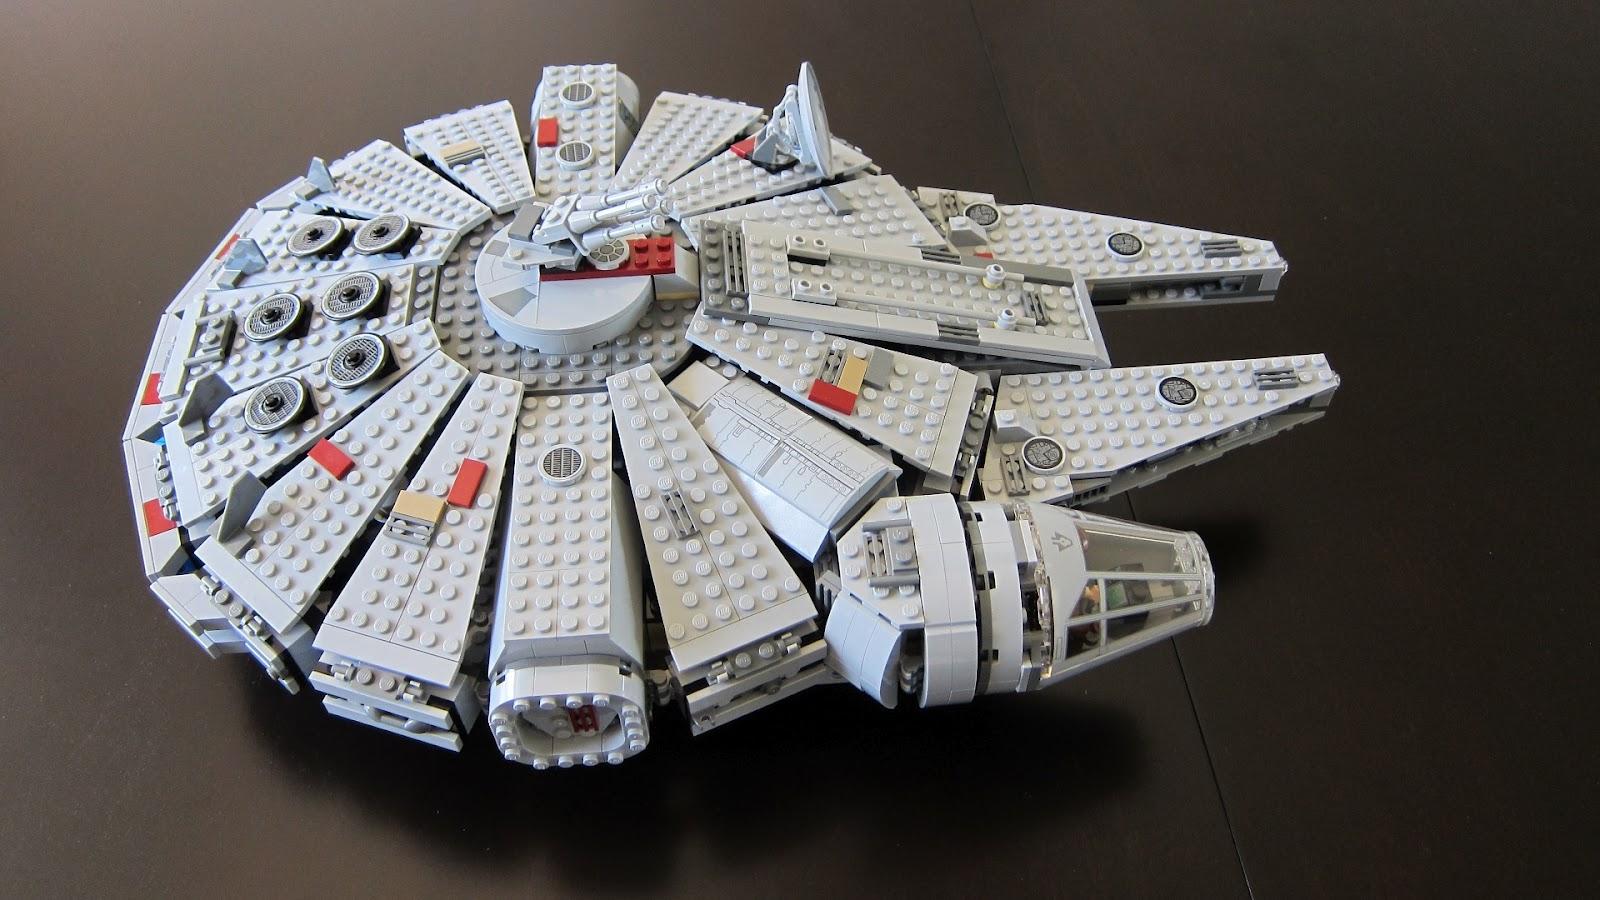 eternal ephemeron lego star wars 7965 millennium falcon. Black Bedroom Furniture Sets. Home Design Ideas